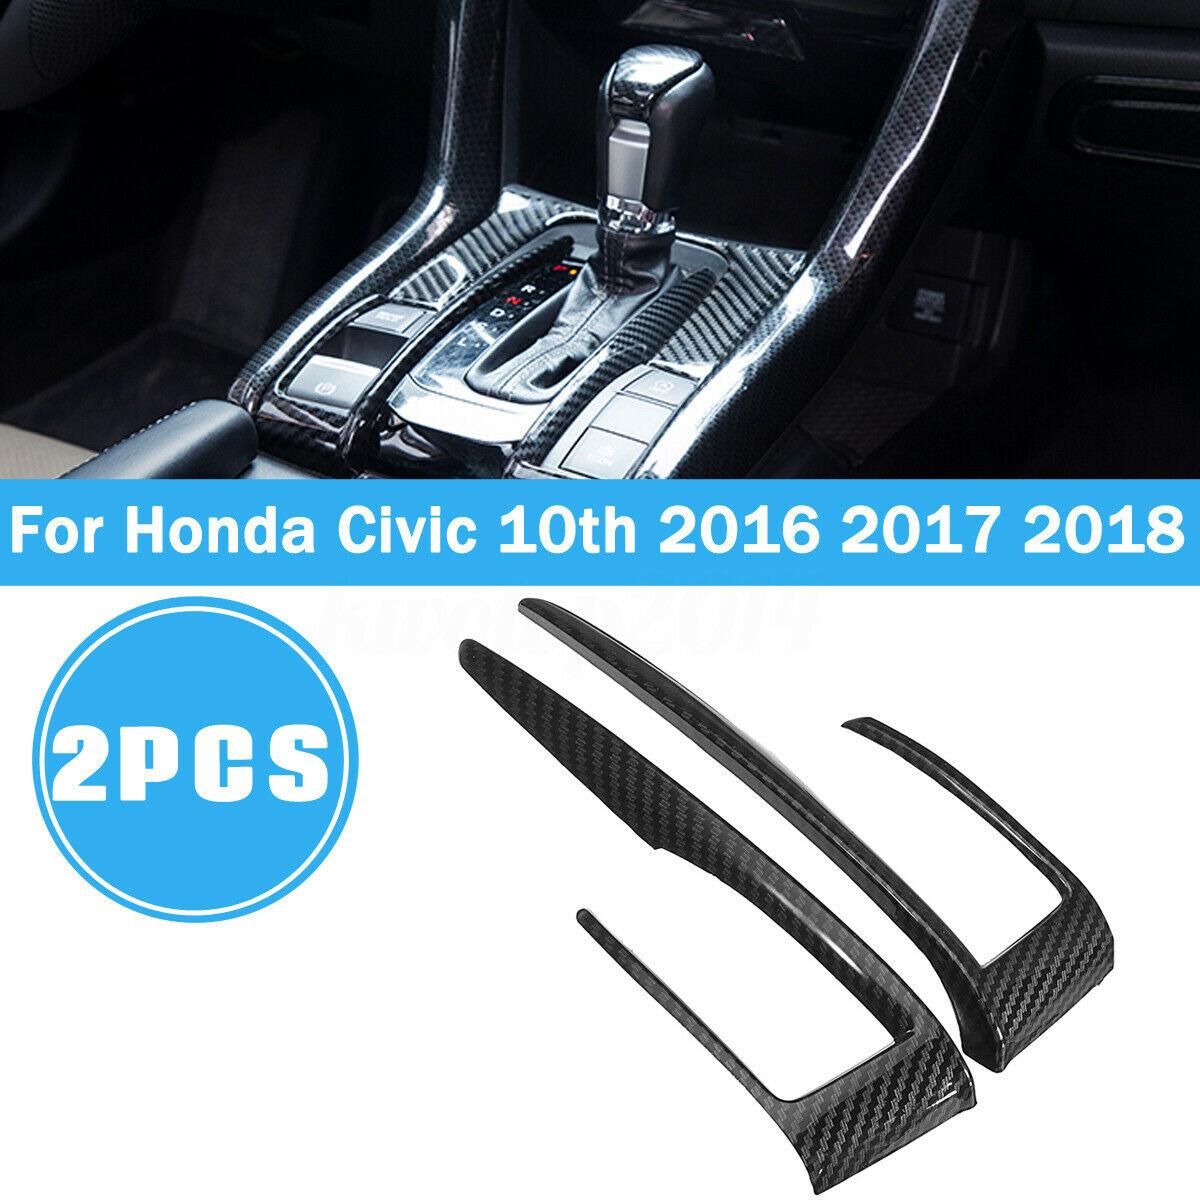 2pcs/set Carbon Fiber Gear Shift Frame Cover Trim For Honda Civic 10th 2016 2017 2018 Carbon fiber